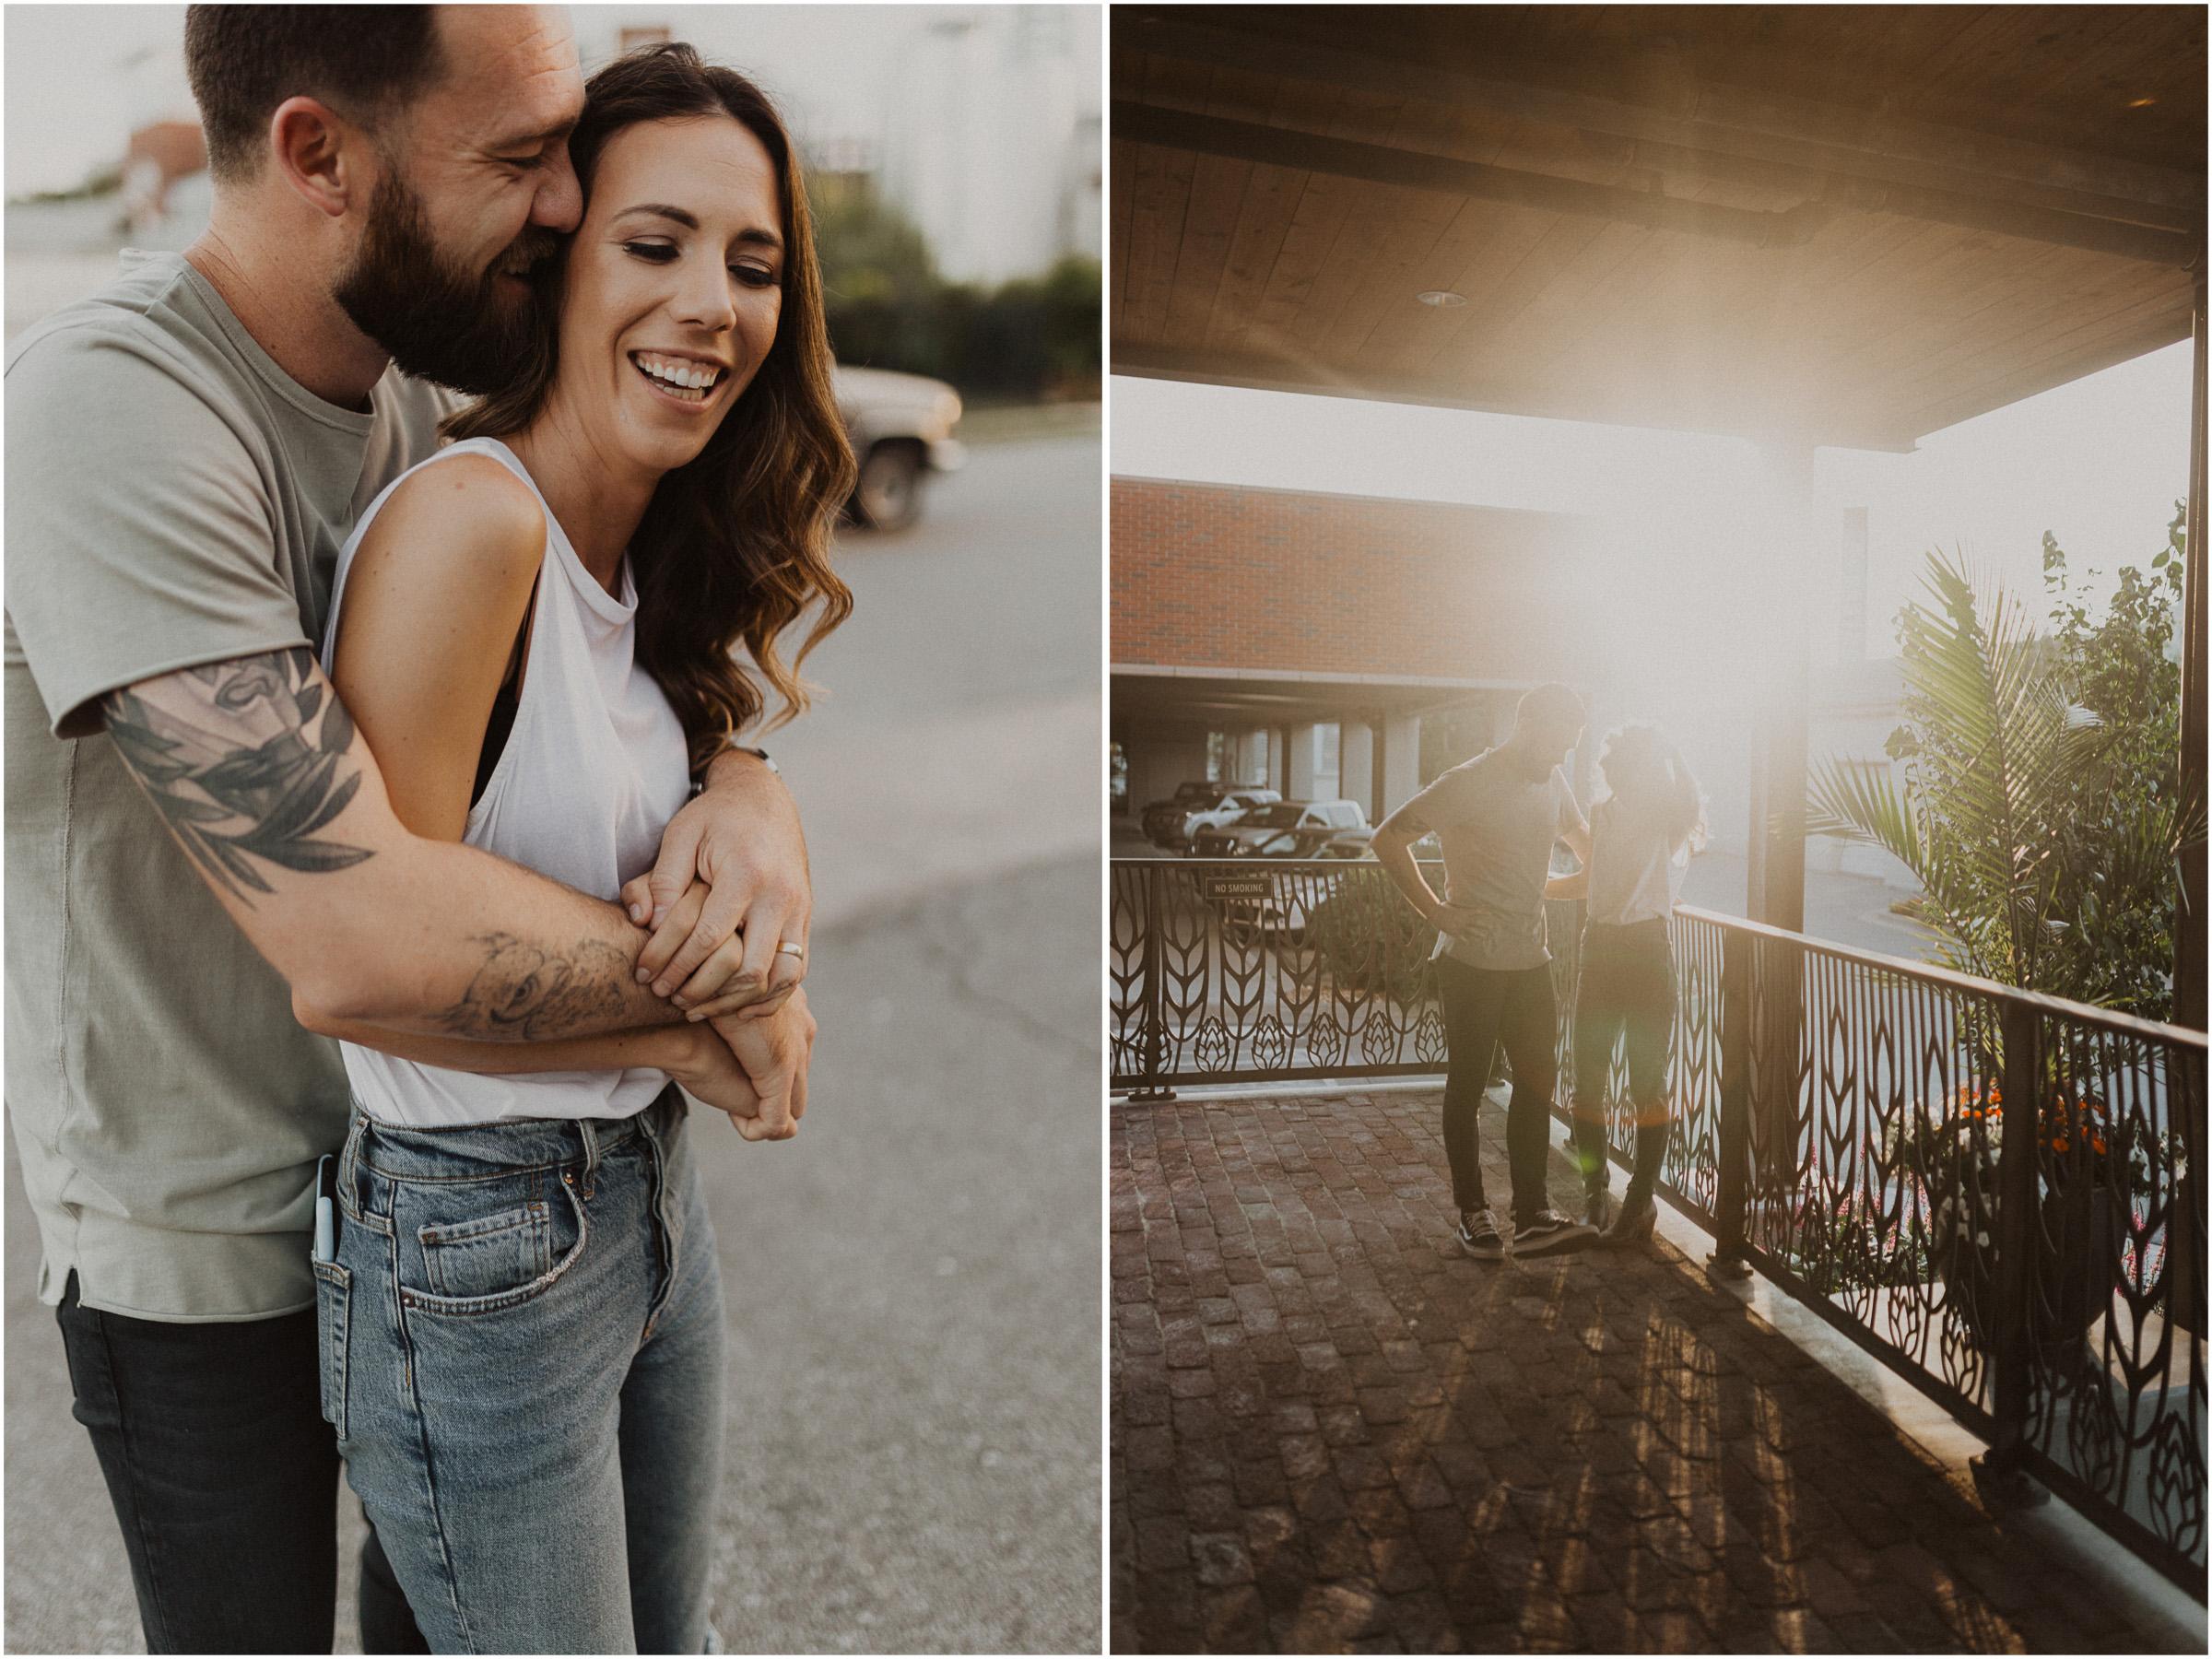 alyssa barletter photography downtown kansas city photos with couple and aussies austrailian shepards-7.jpg